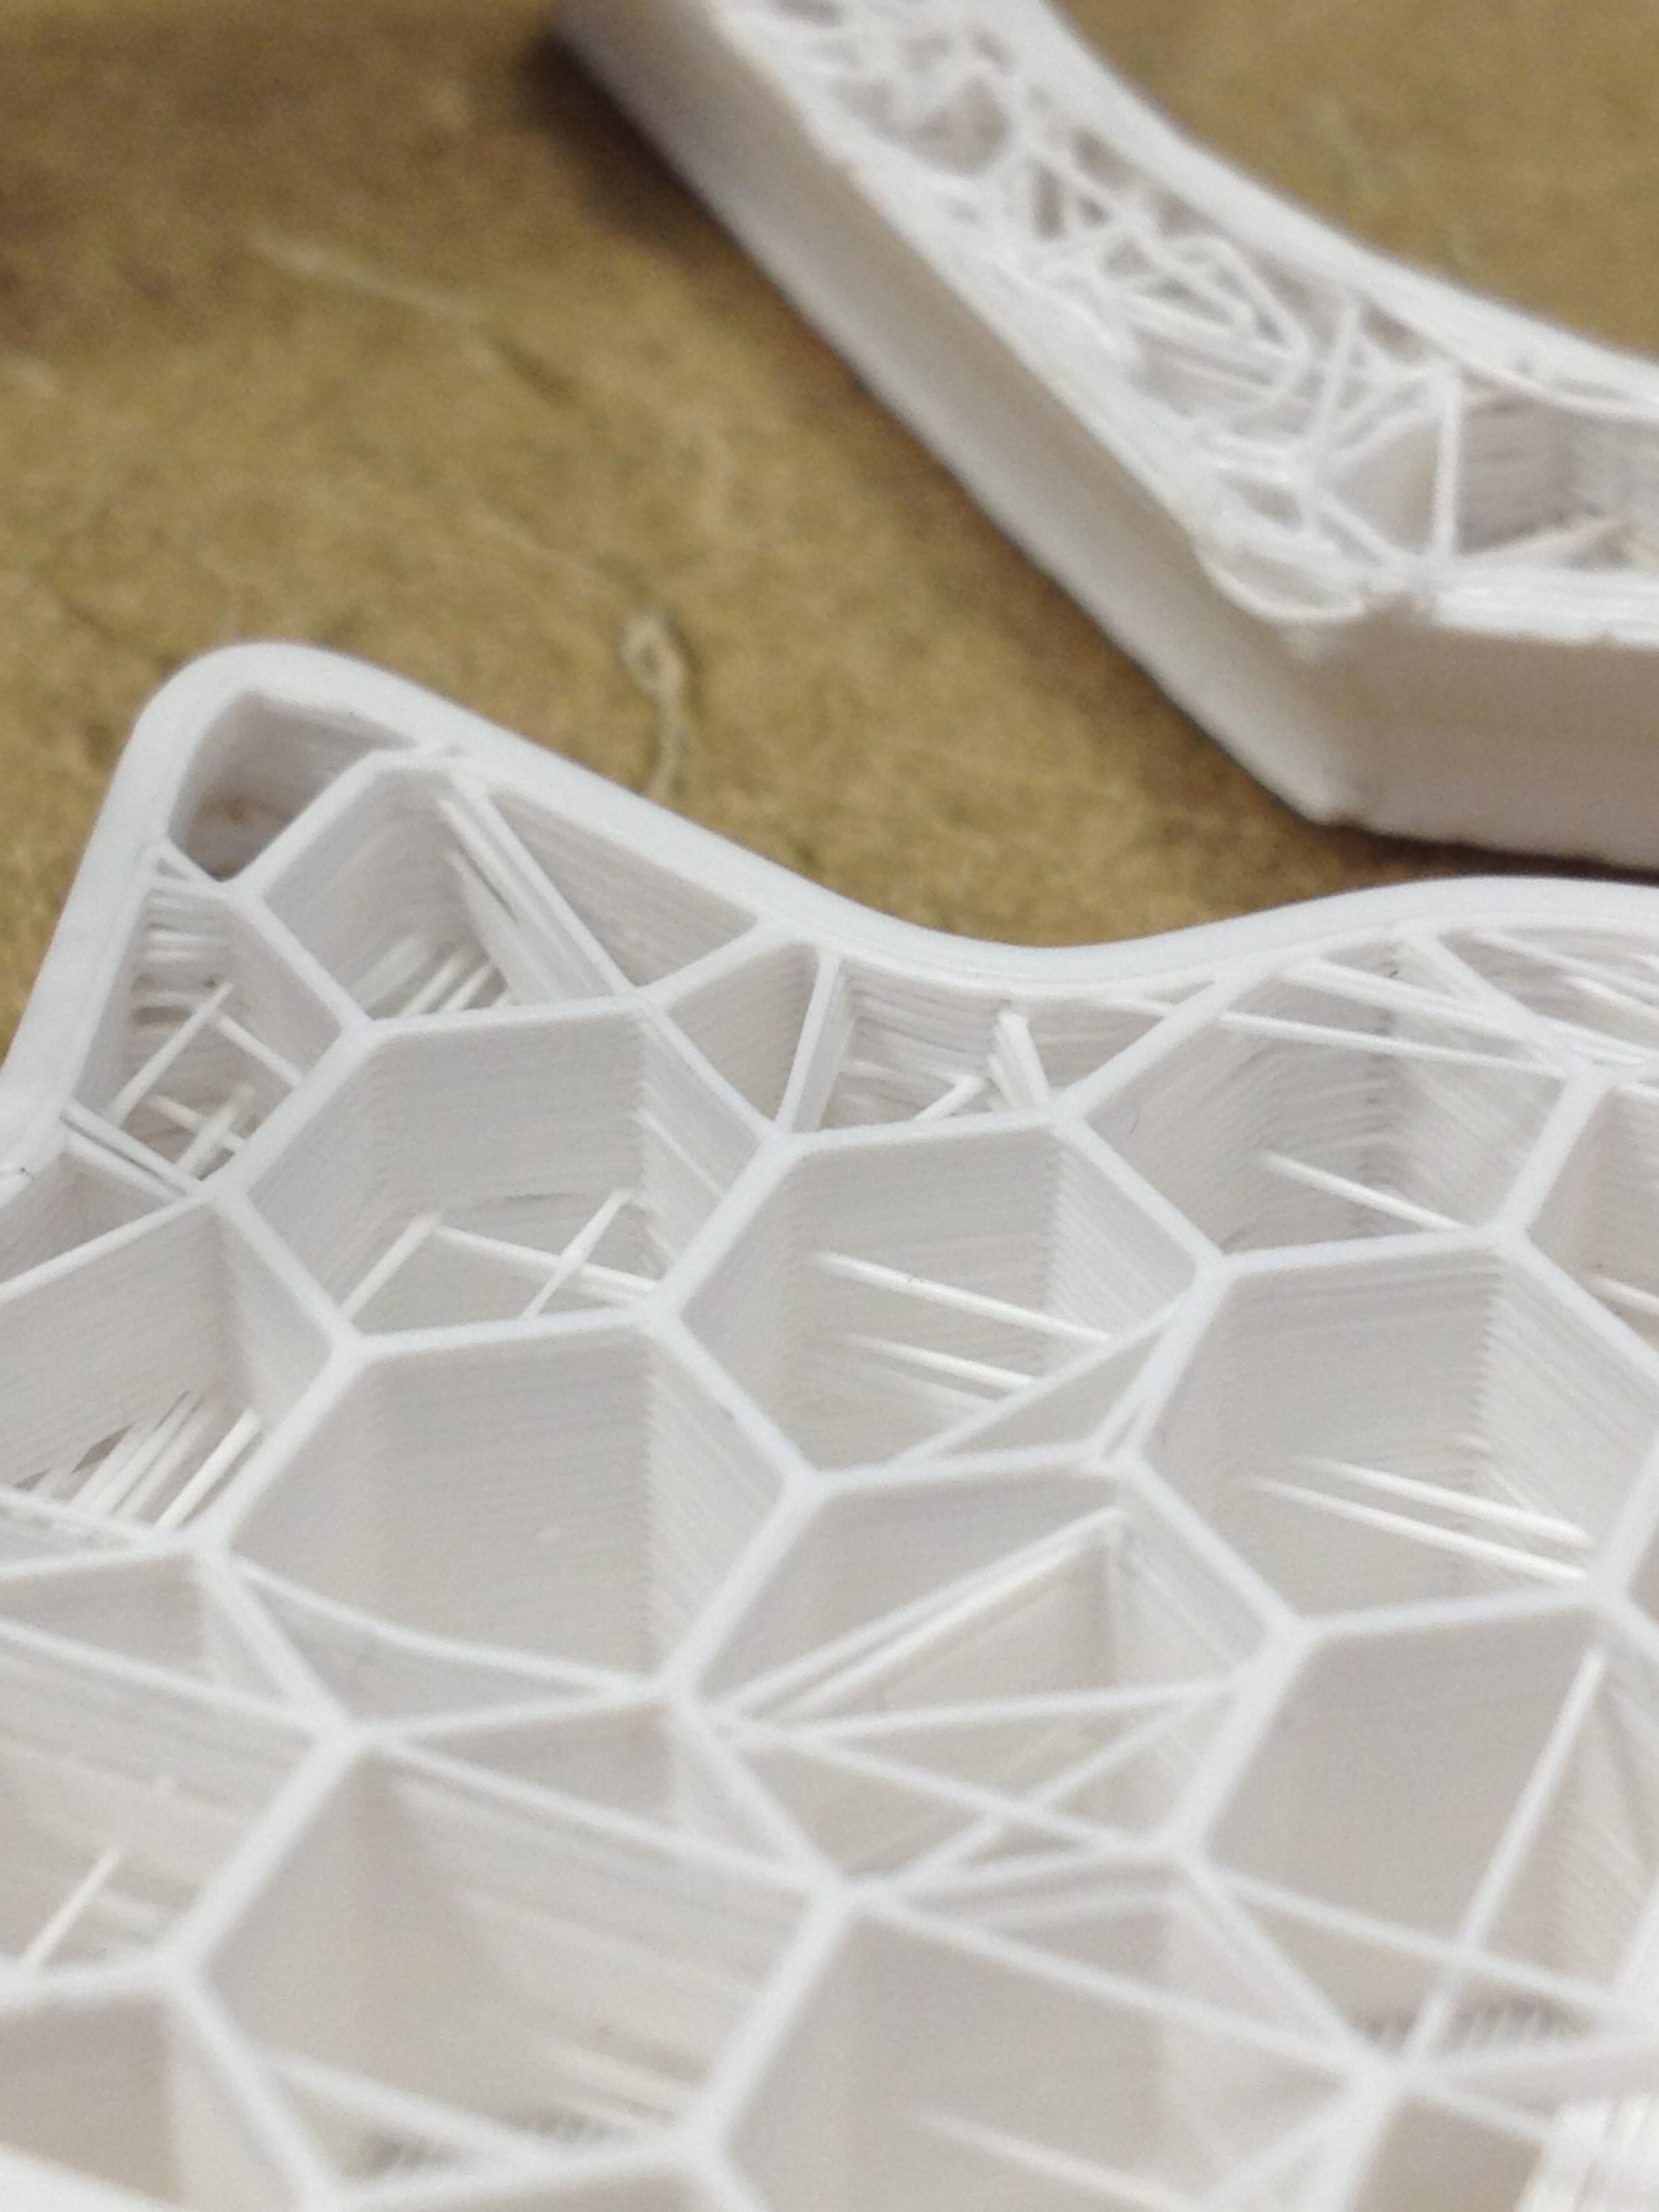 Inner detail of a failed teacup dragon print.